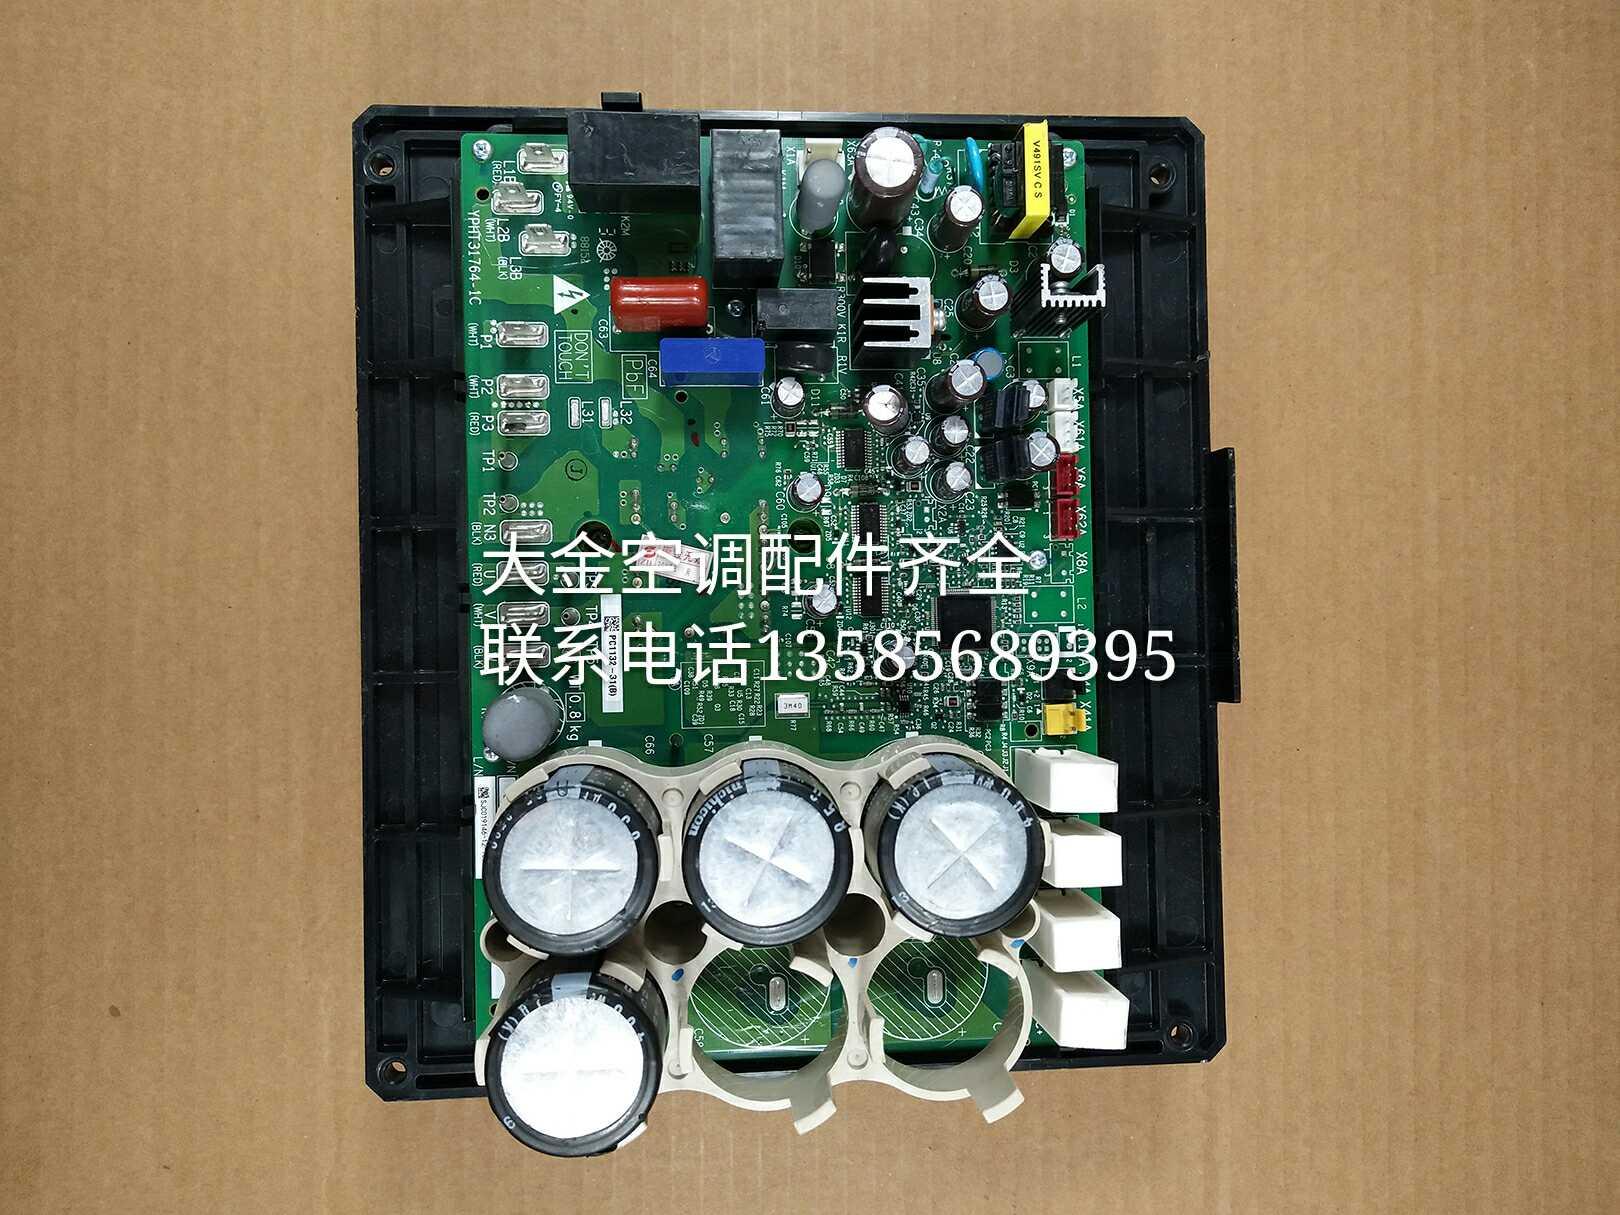 b) PC1132-31 nagy v3 dupla 变频 PC1132-1 (b modul) a 变频 modul